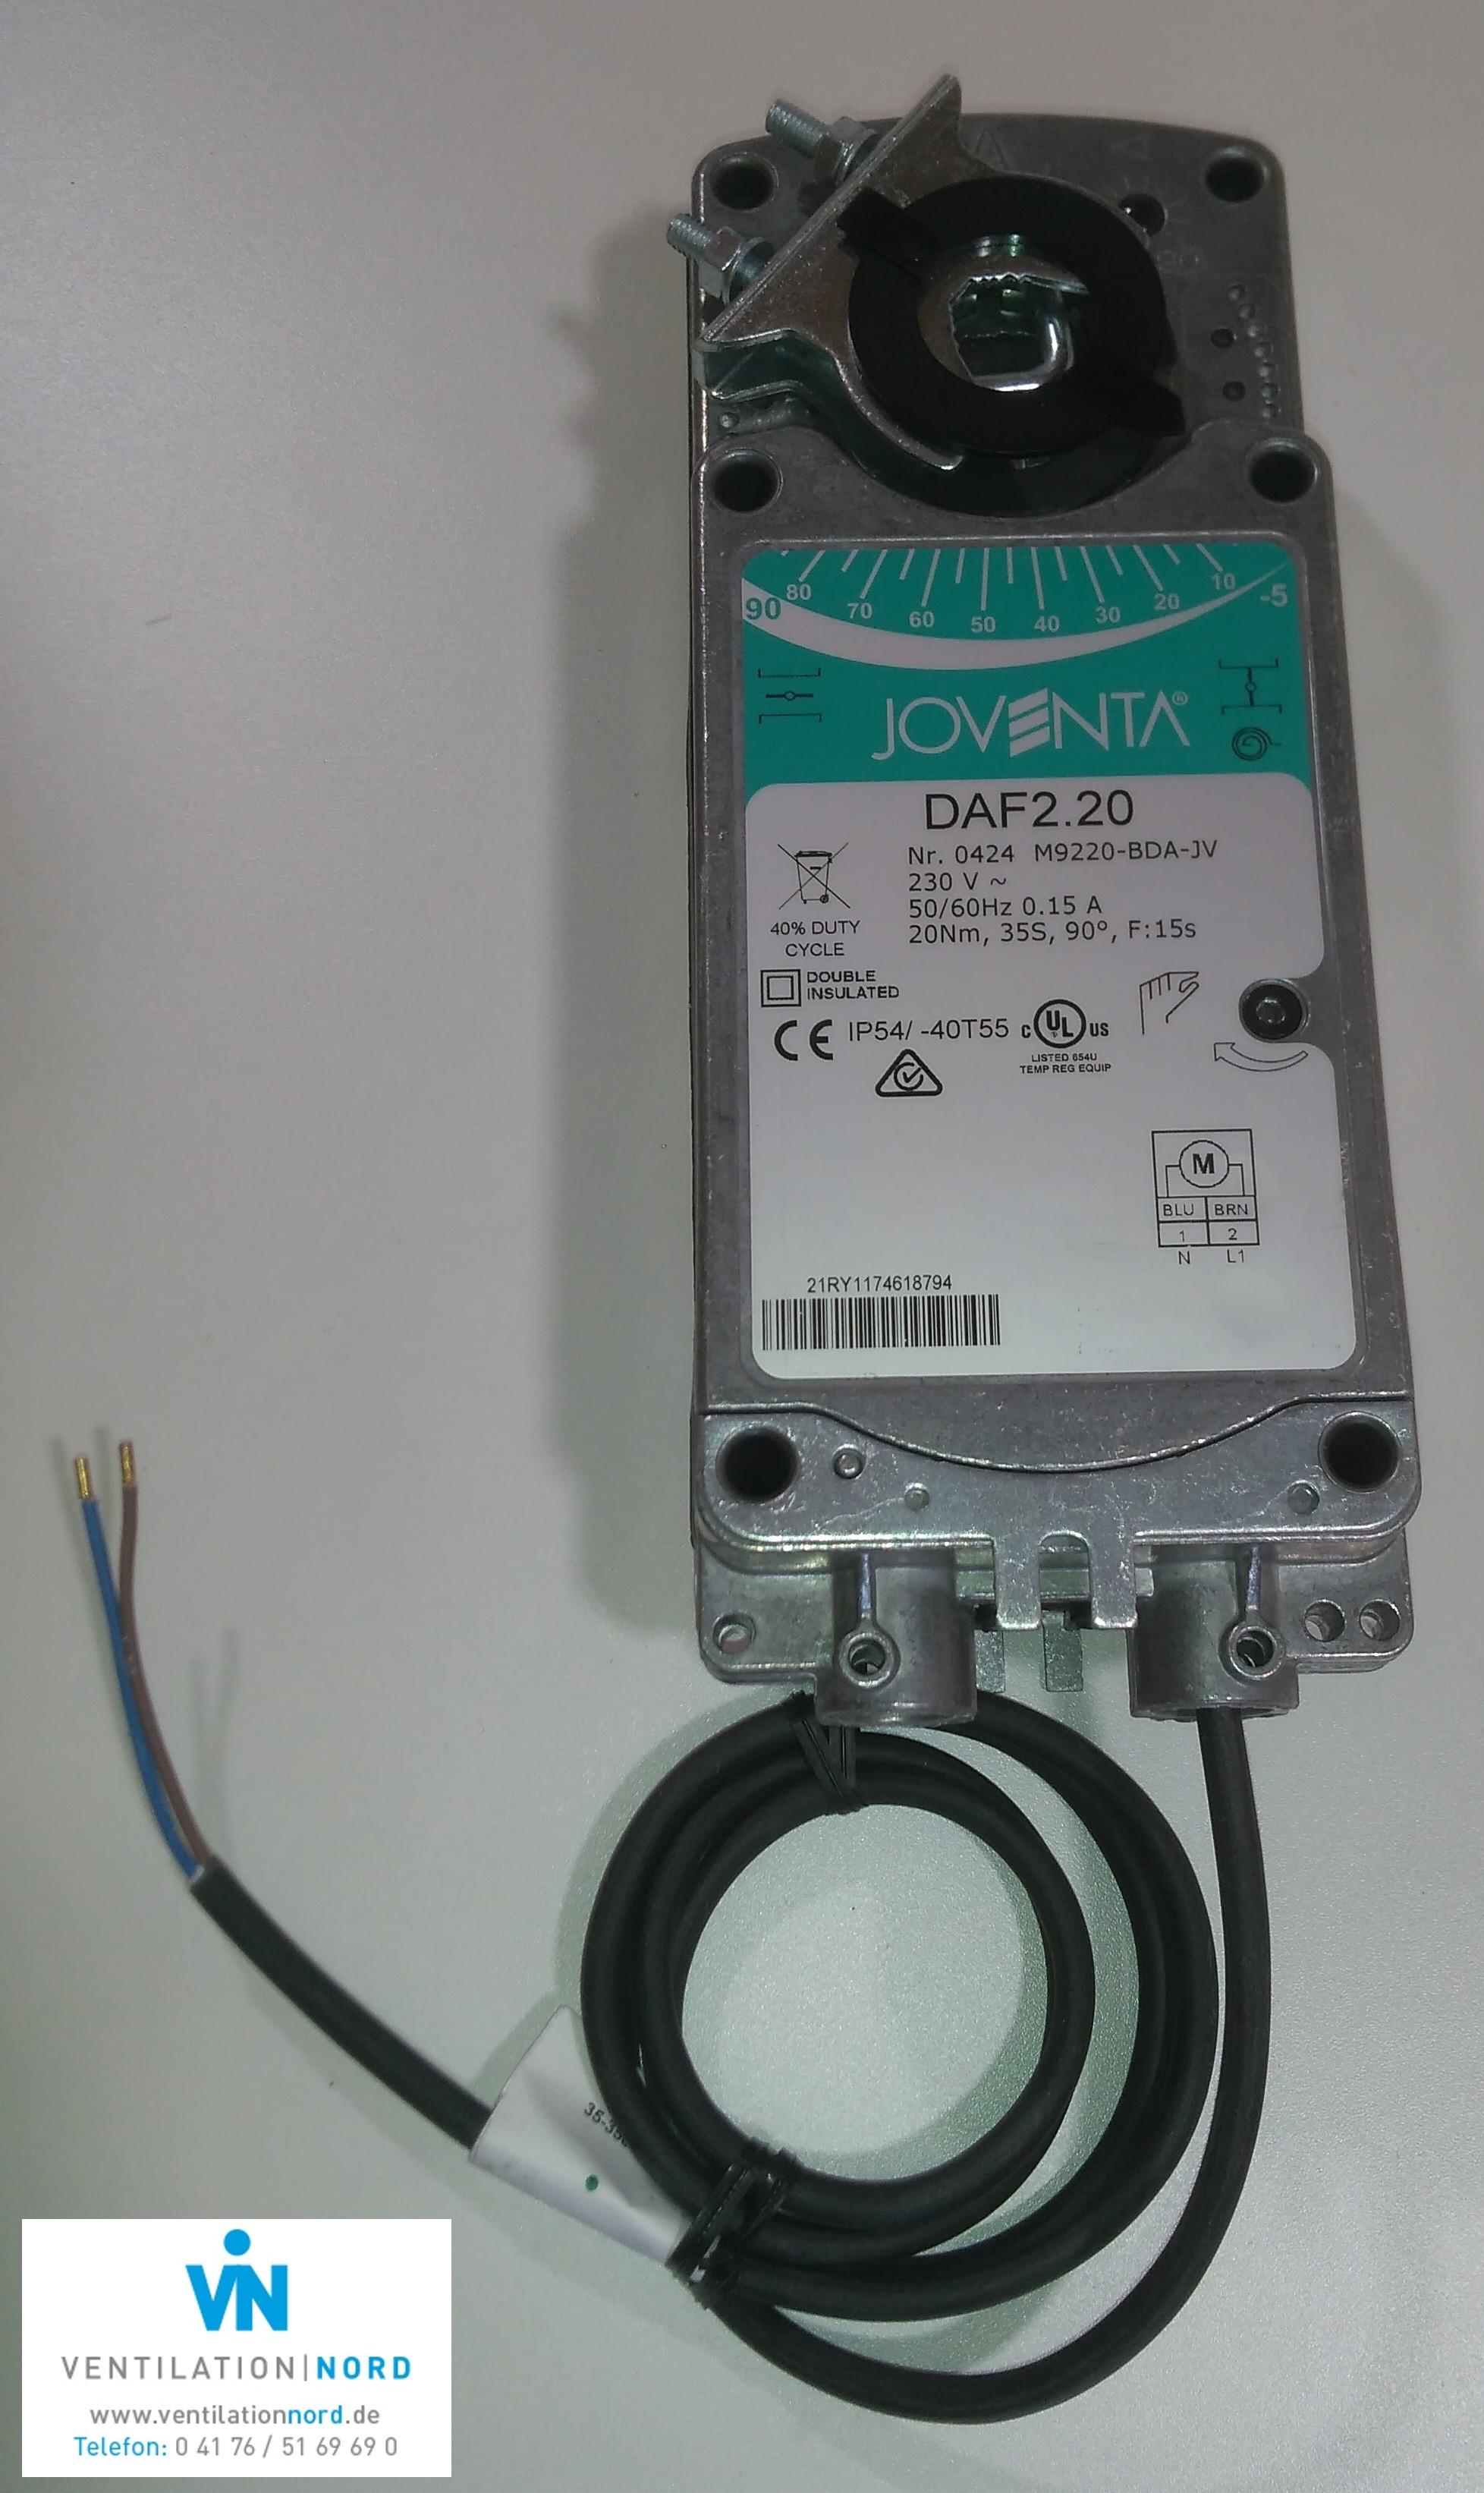 Joventa Klappenstellantrieb DAF2.20 Federrücklauf